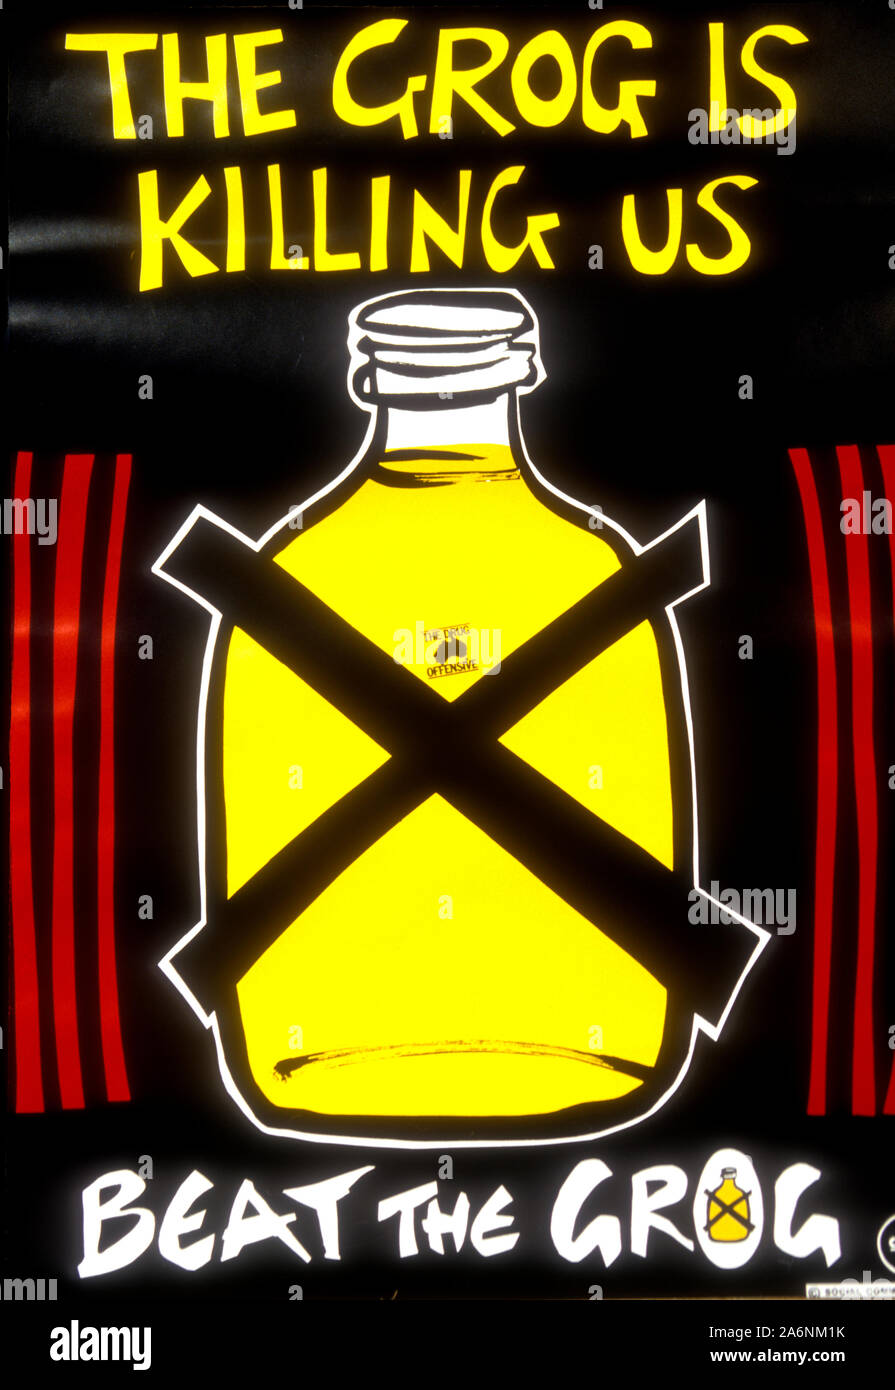 alcohol abuse poster stockfotos und